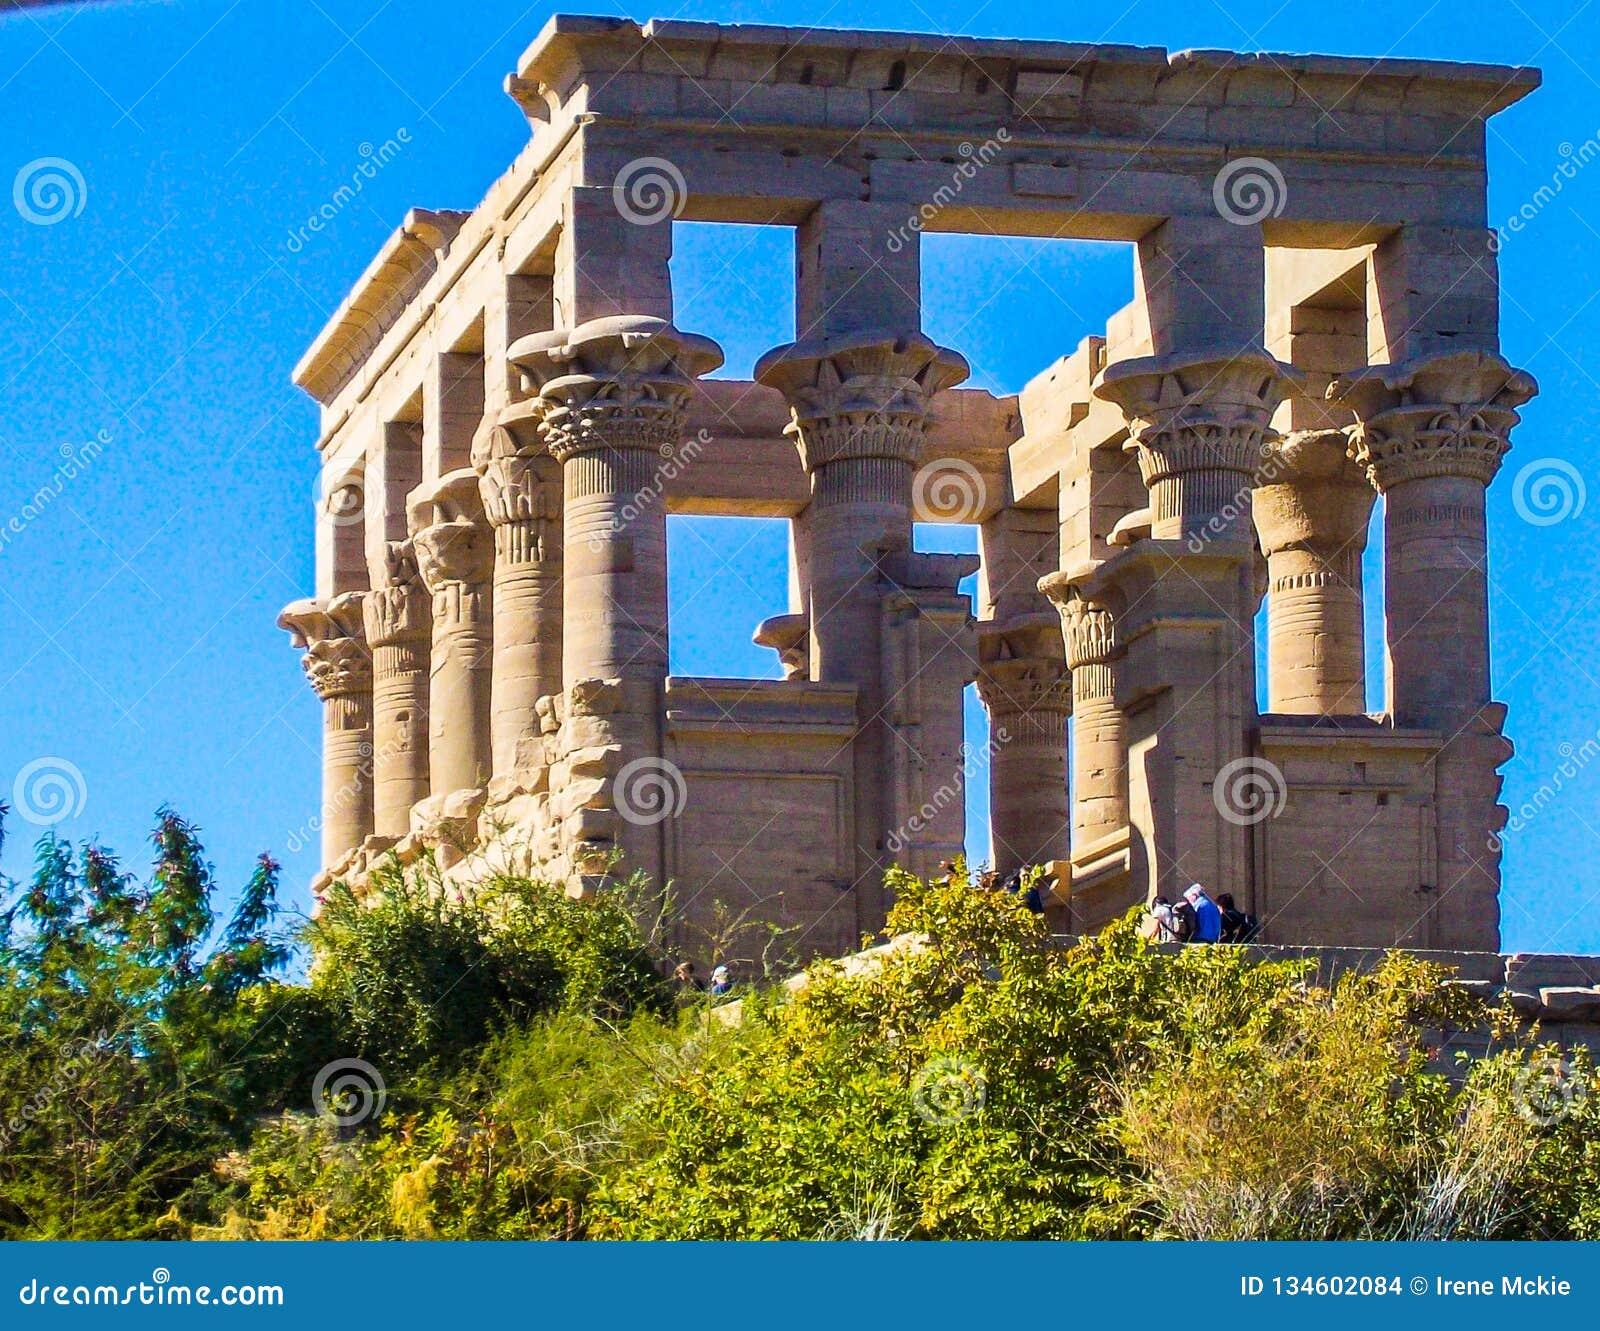 Ägypten, Nil, ägyptischer Tempel, Ruinen, auf Abhang, Spalten des Quadrats 12, blauer Himmel